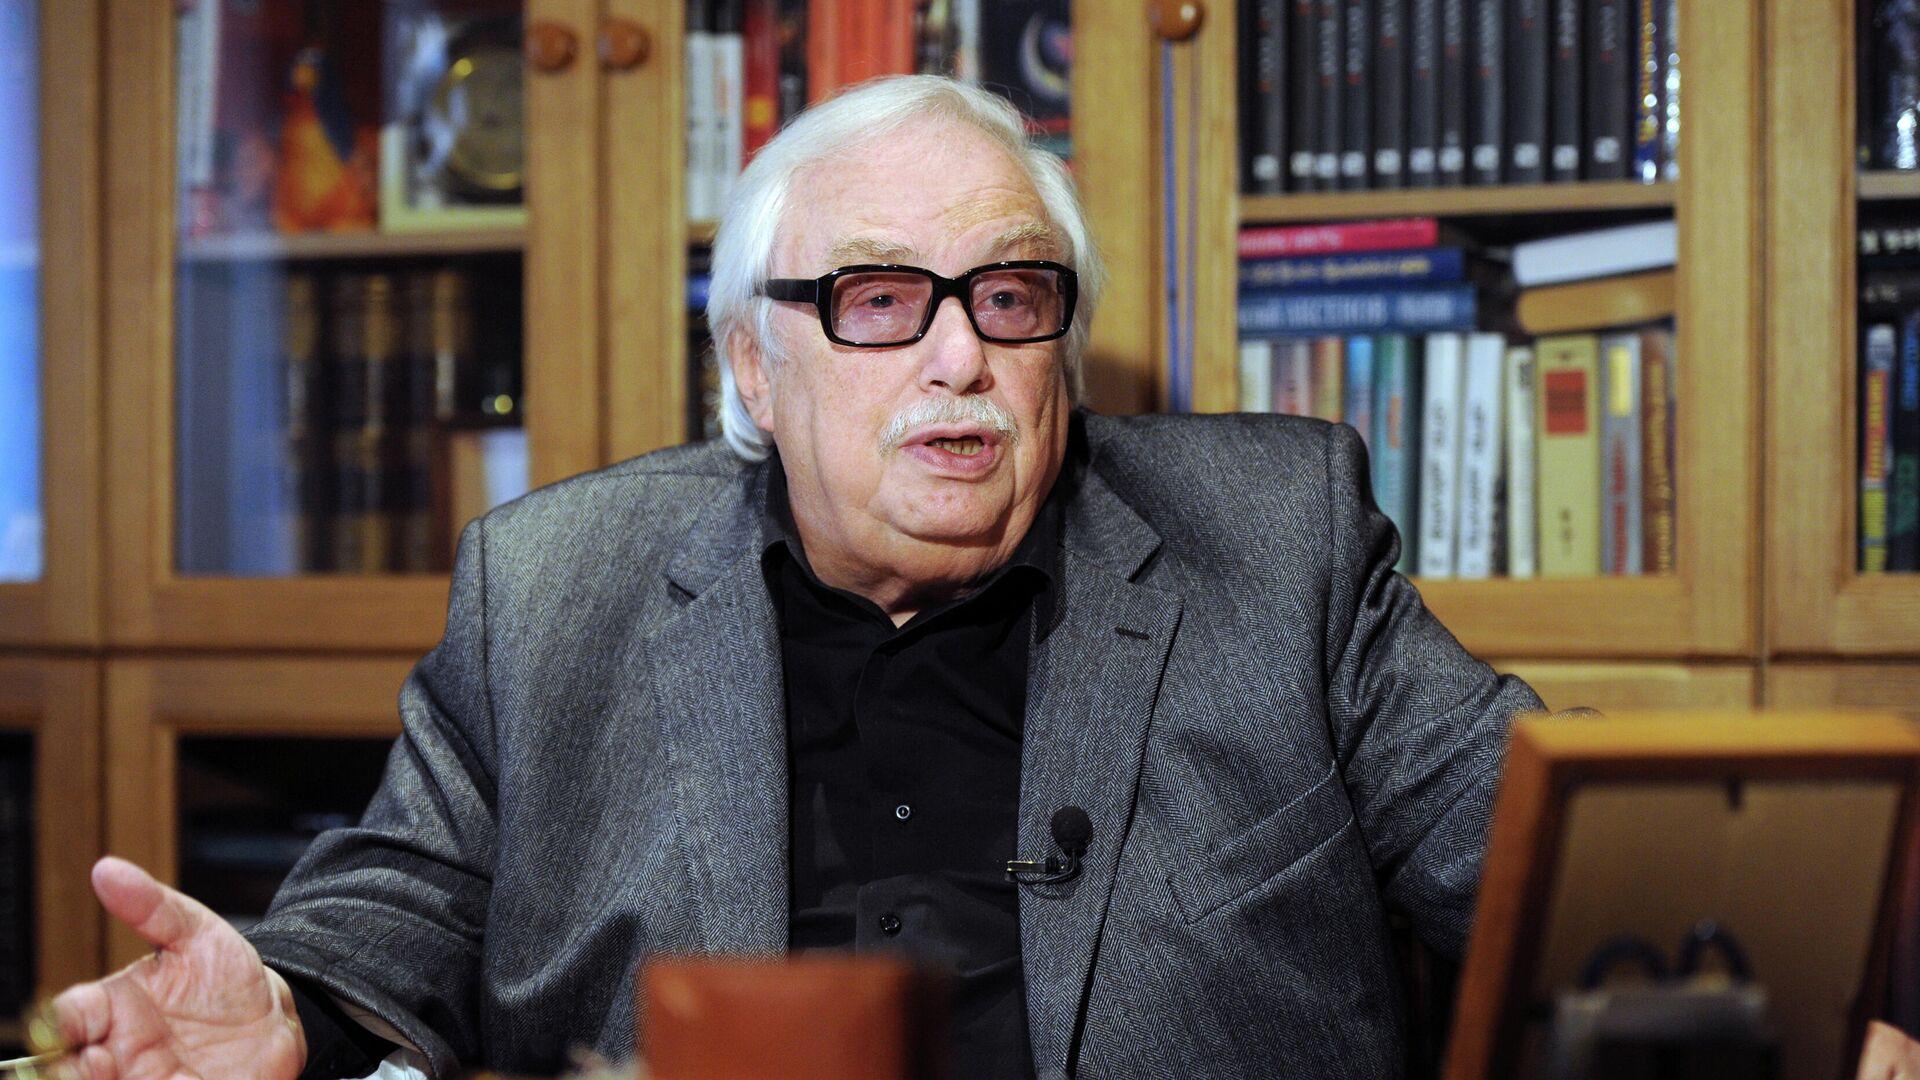 Президент Международной академии телевидения Анатолий Лысенко - РИА Новости, 1920, 20.06.2021